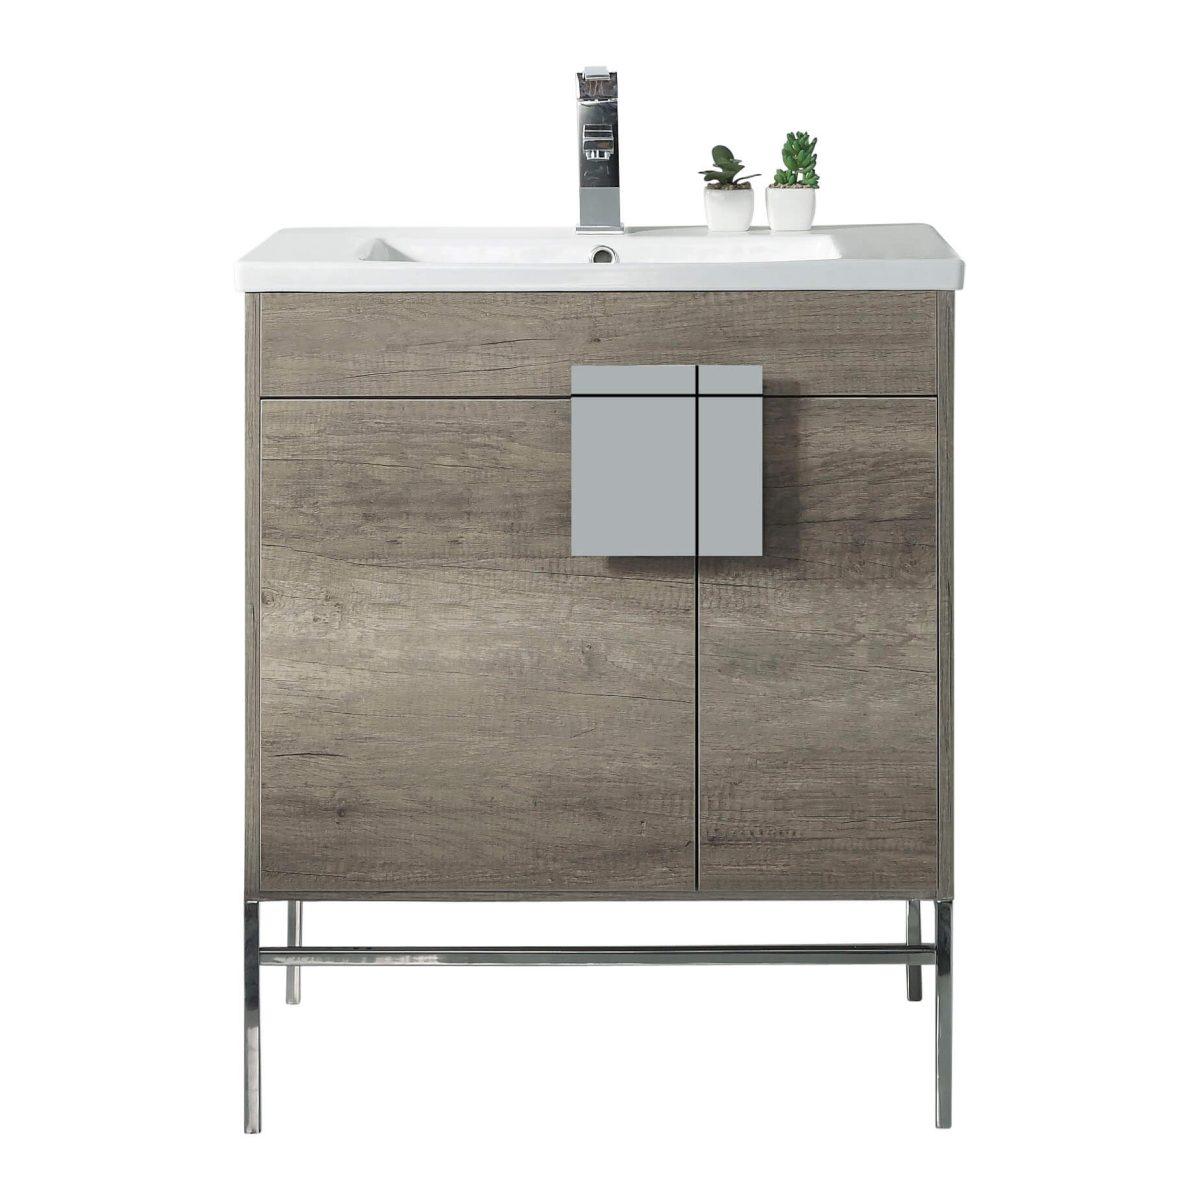 "Shawbridge 30"" Modern Bathroom Vanity  Shadow Gray with Polished Chrome Hardware"